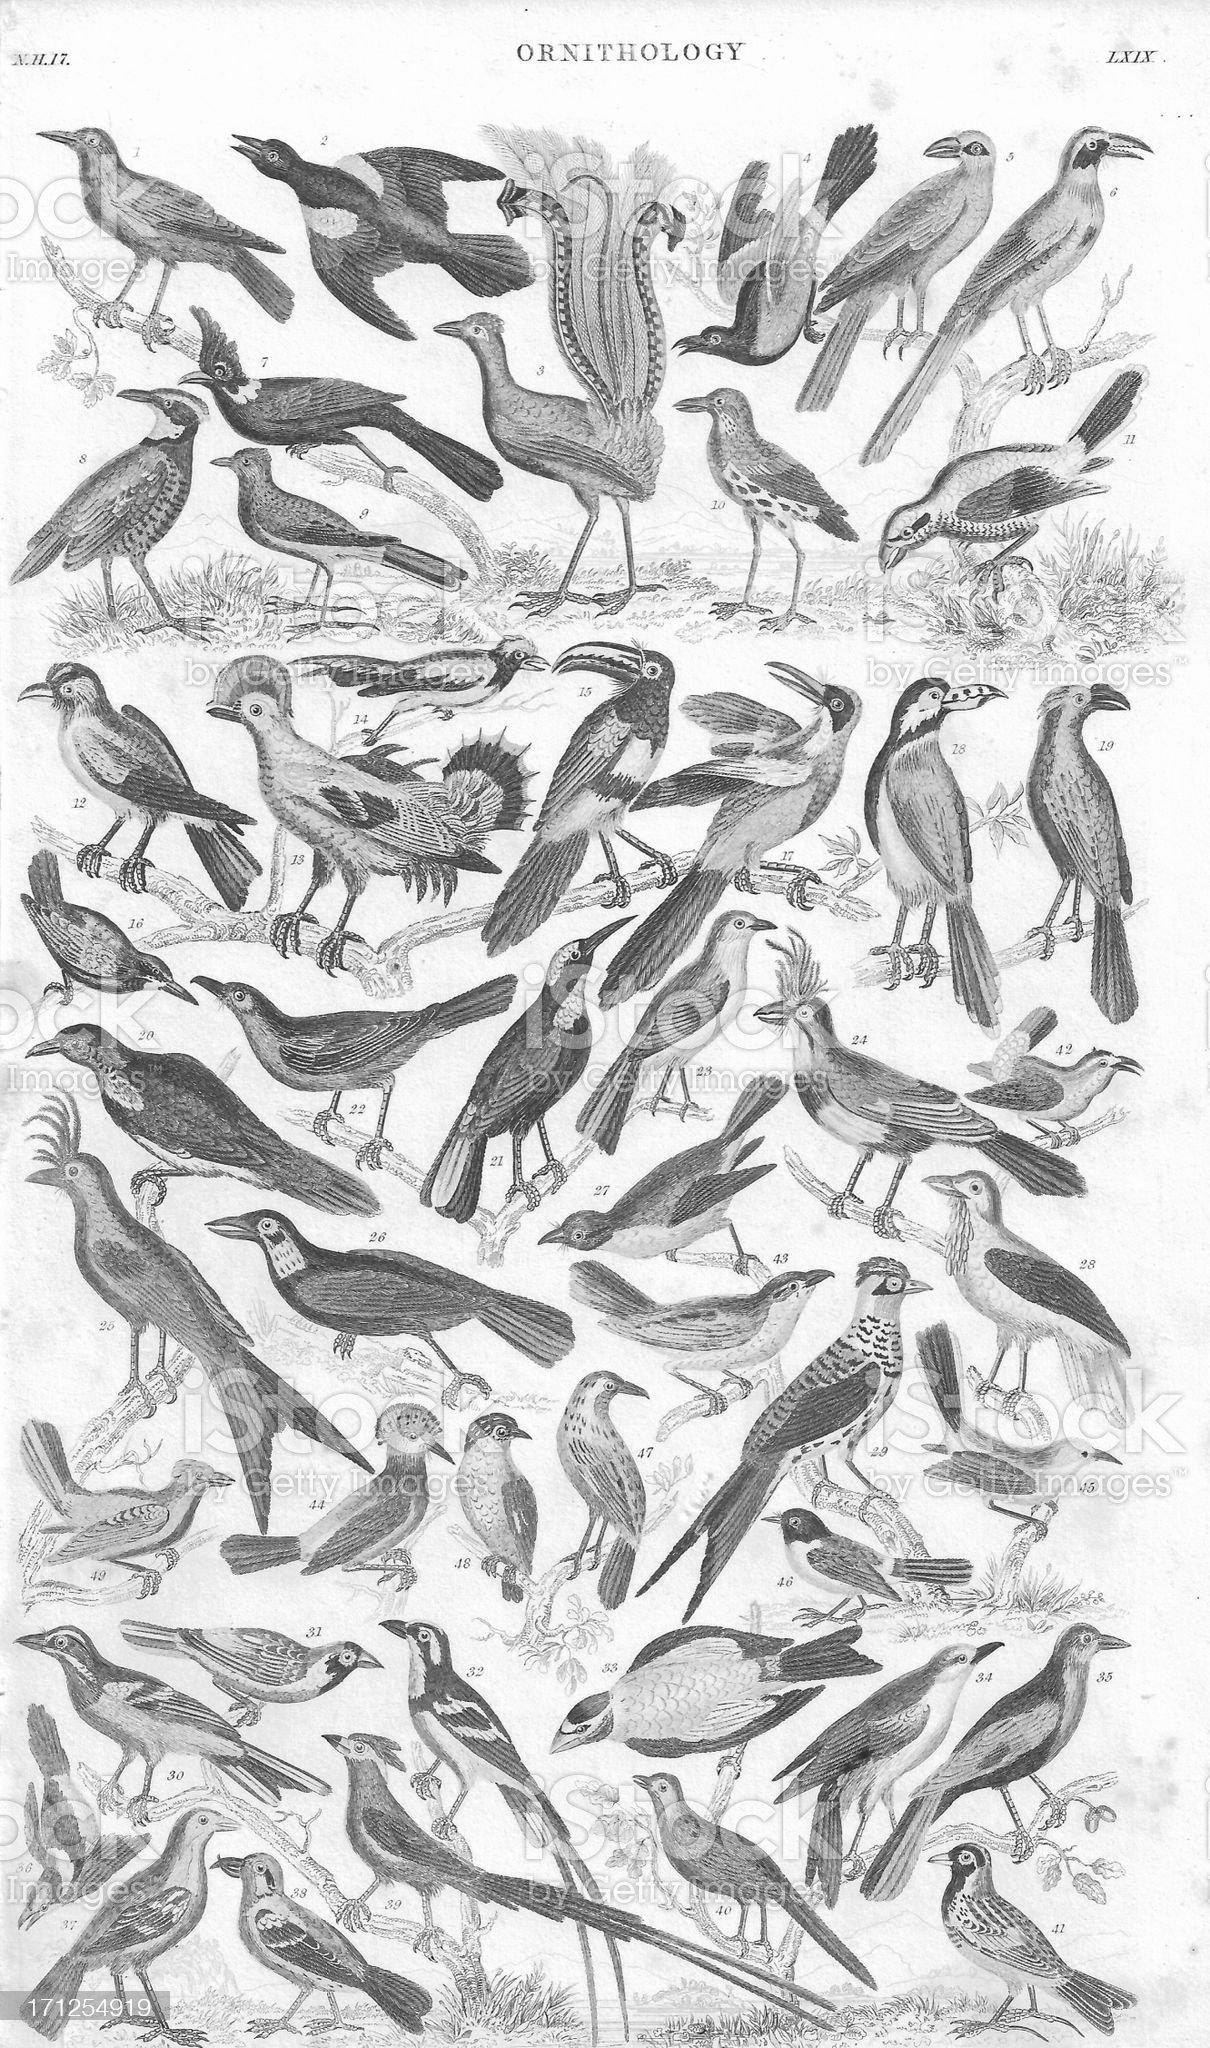 Ornithology old litho print from 1852 royalty-free stock photo